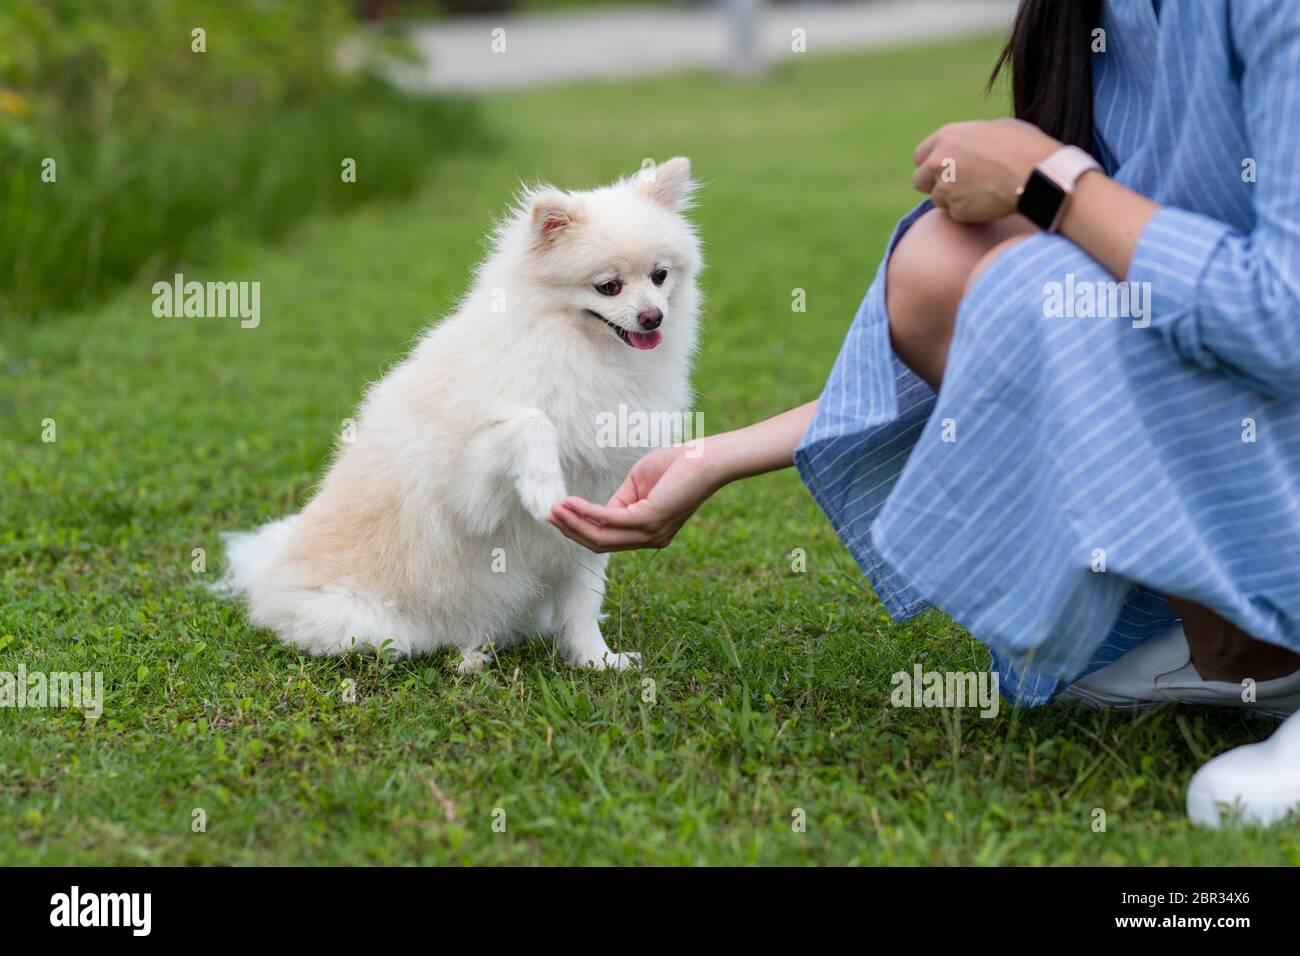 Woman Train On White Pomeranian Dog In The Park Stock Photo Alamy